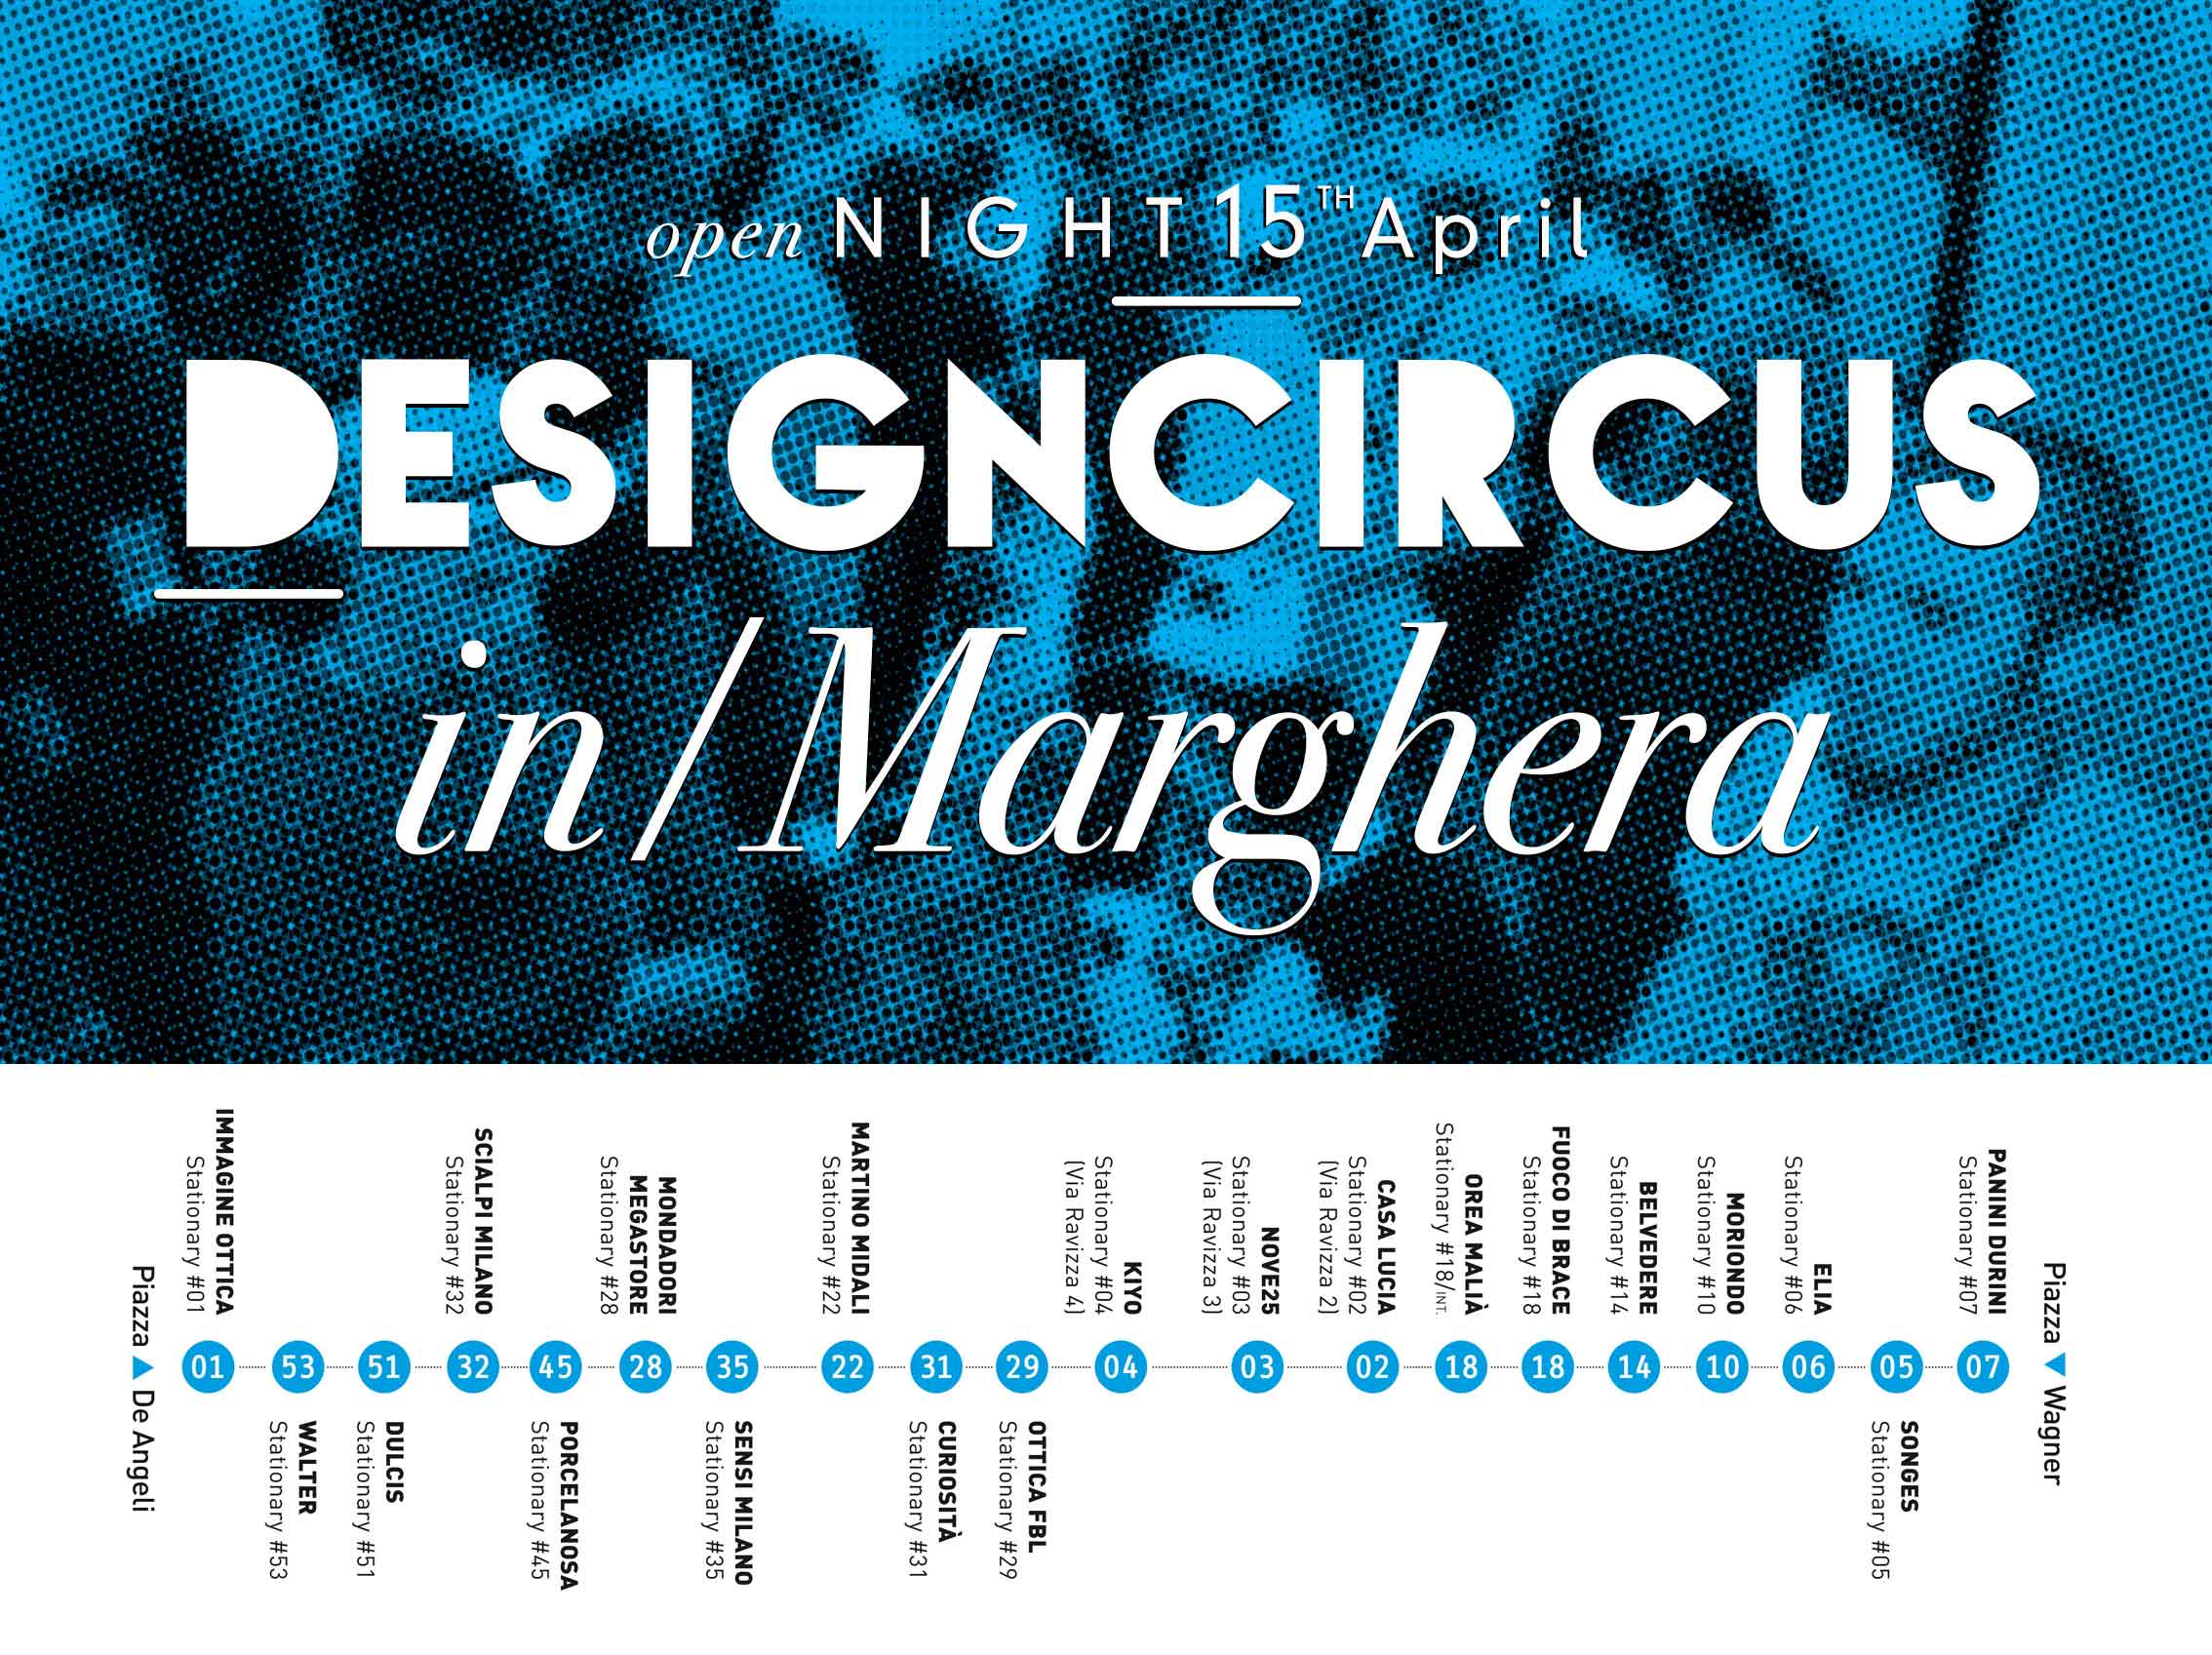 walter design circus 2016